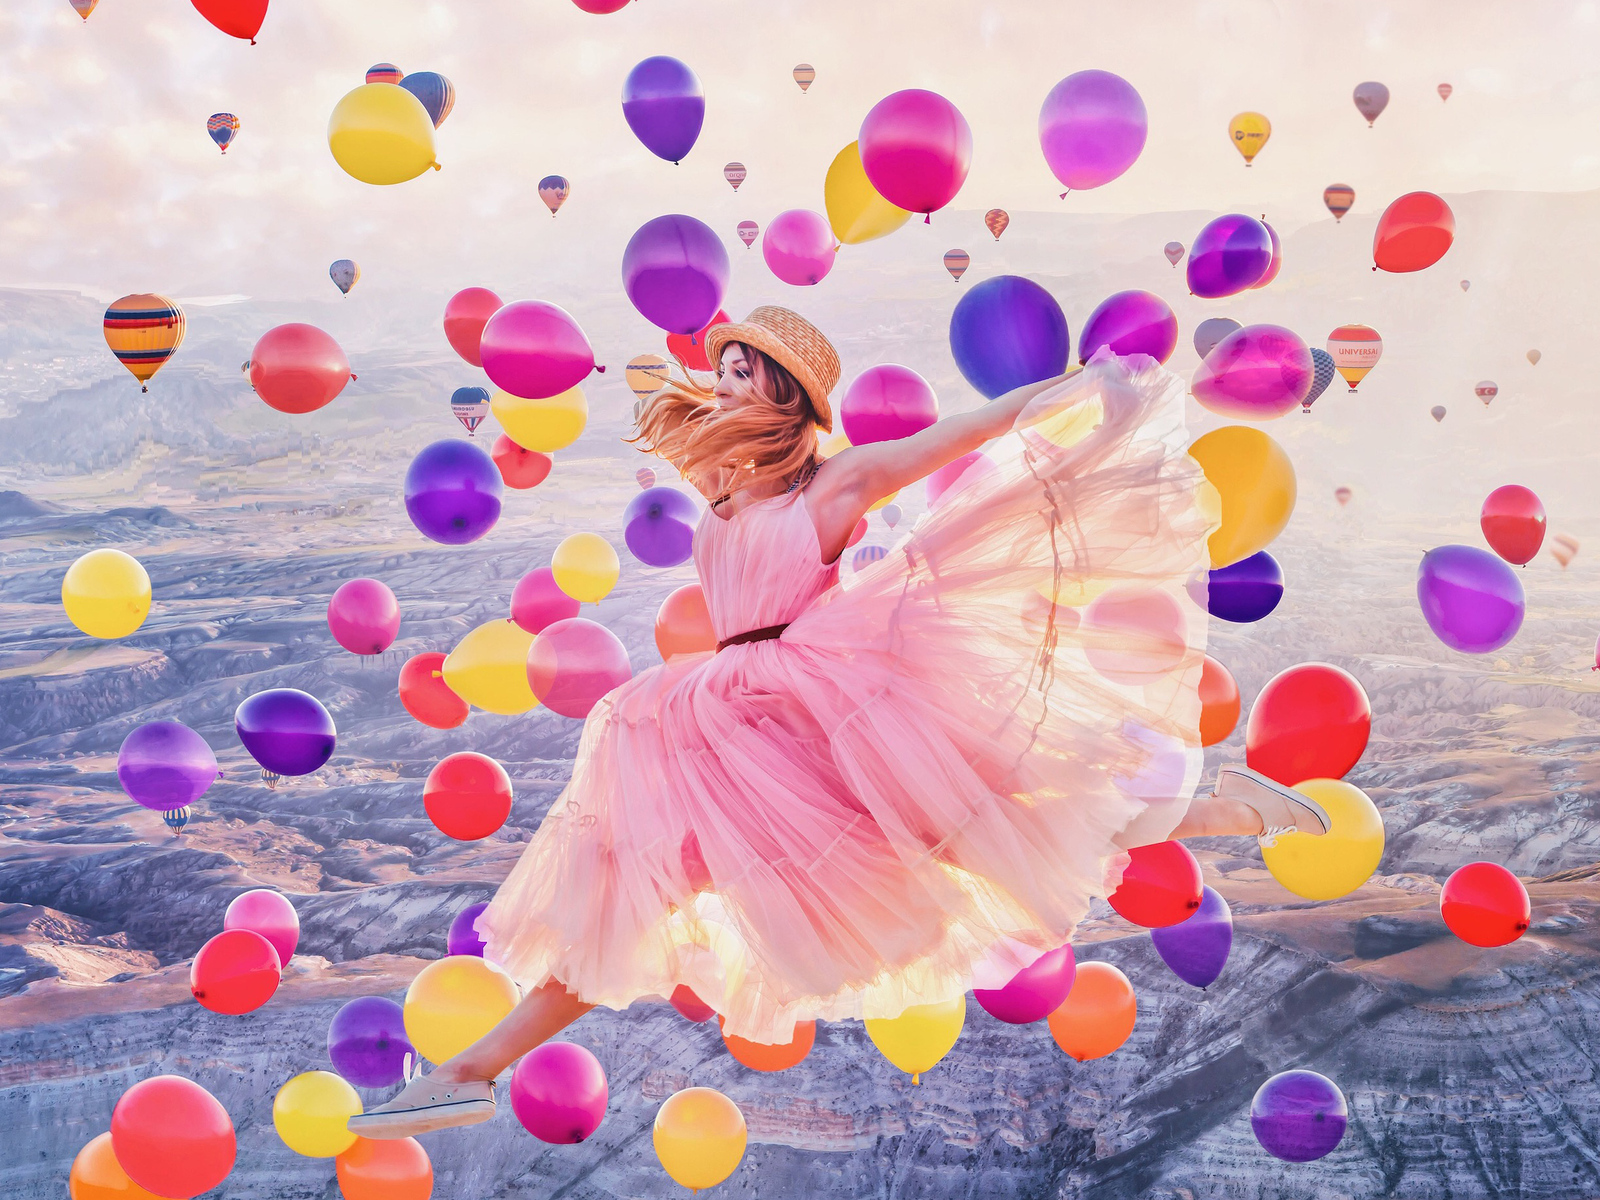 girl-jumping-joy-balloons-4k-fo.jpg